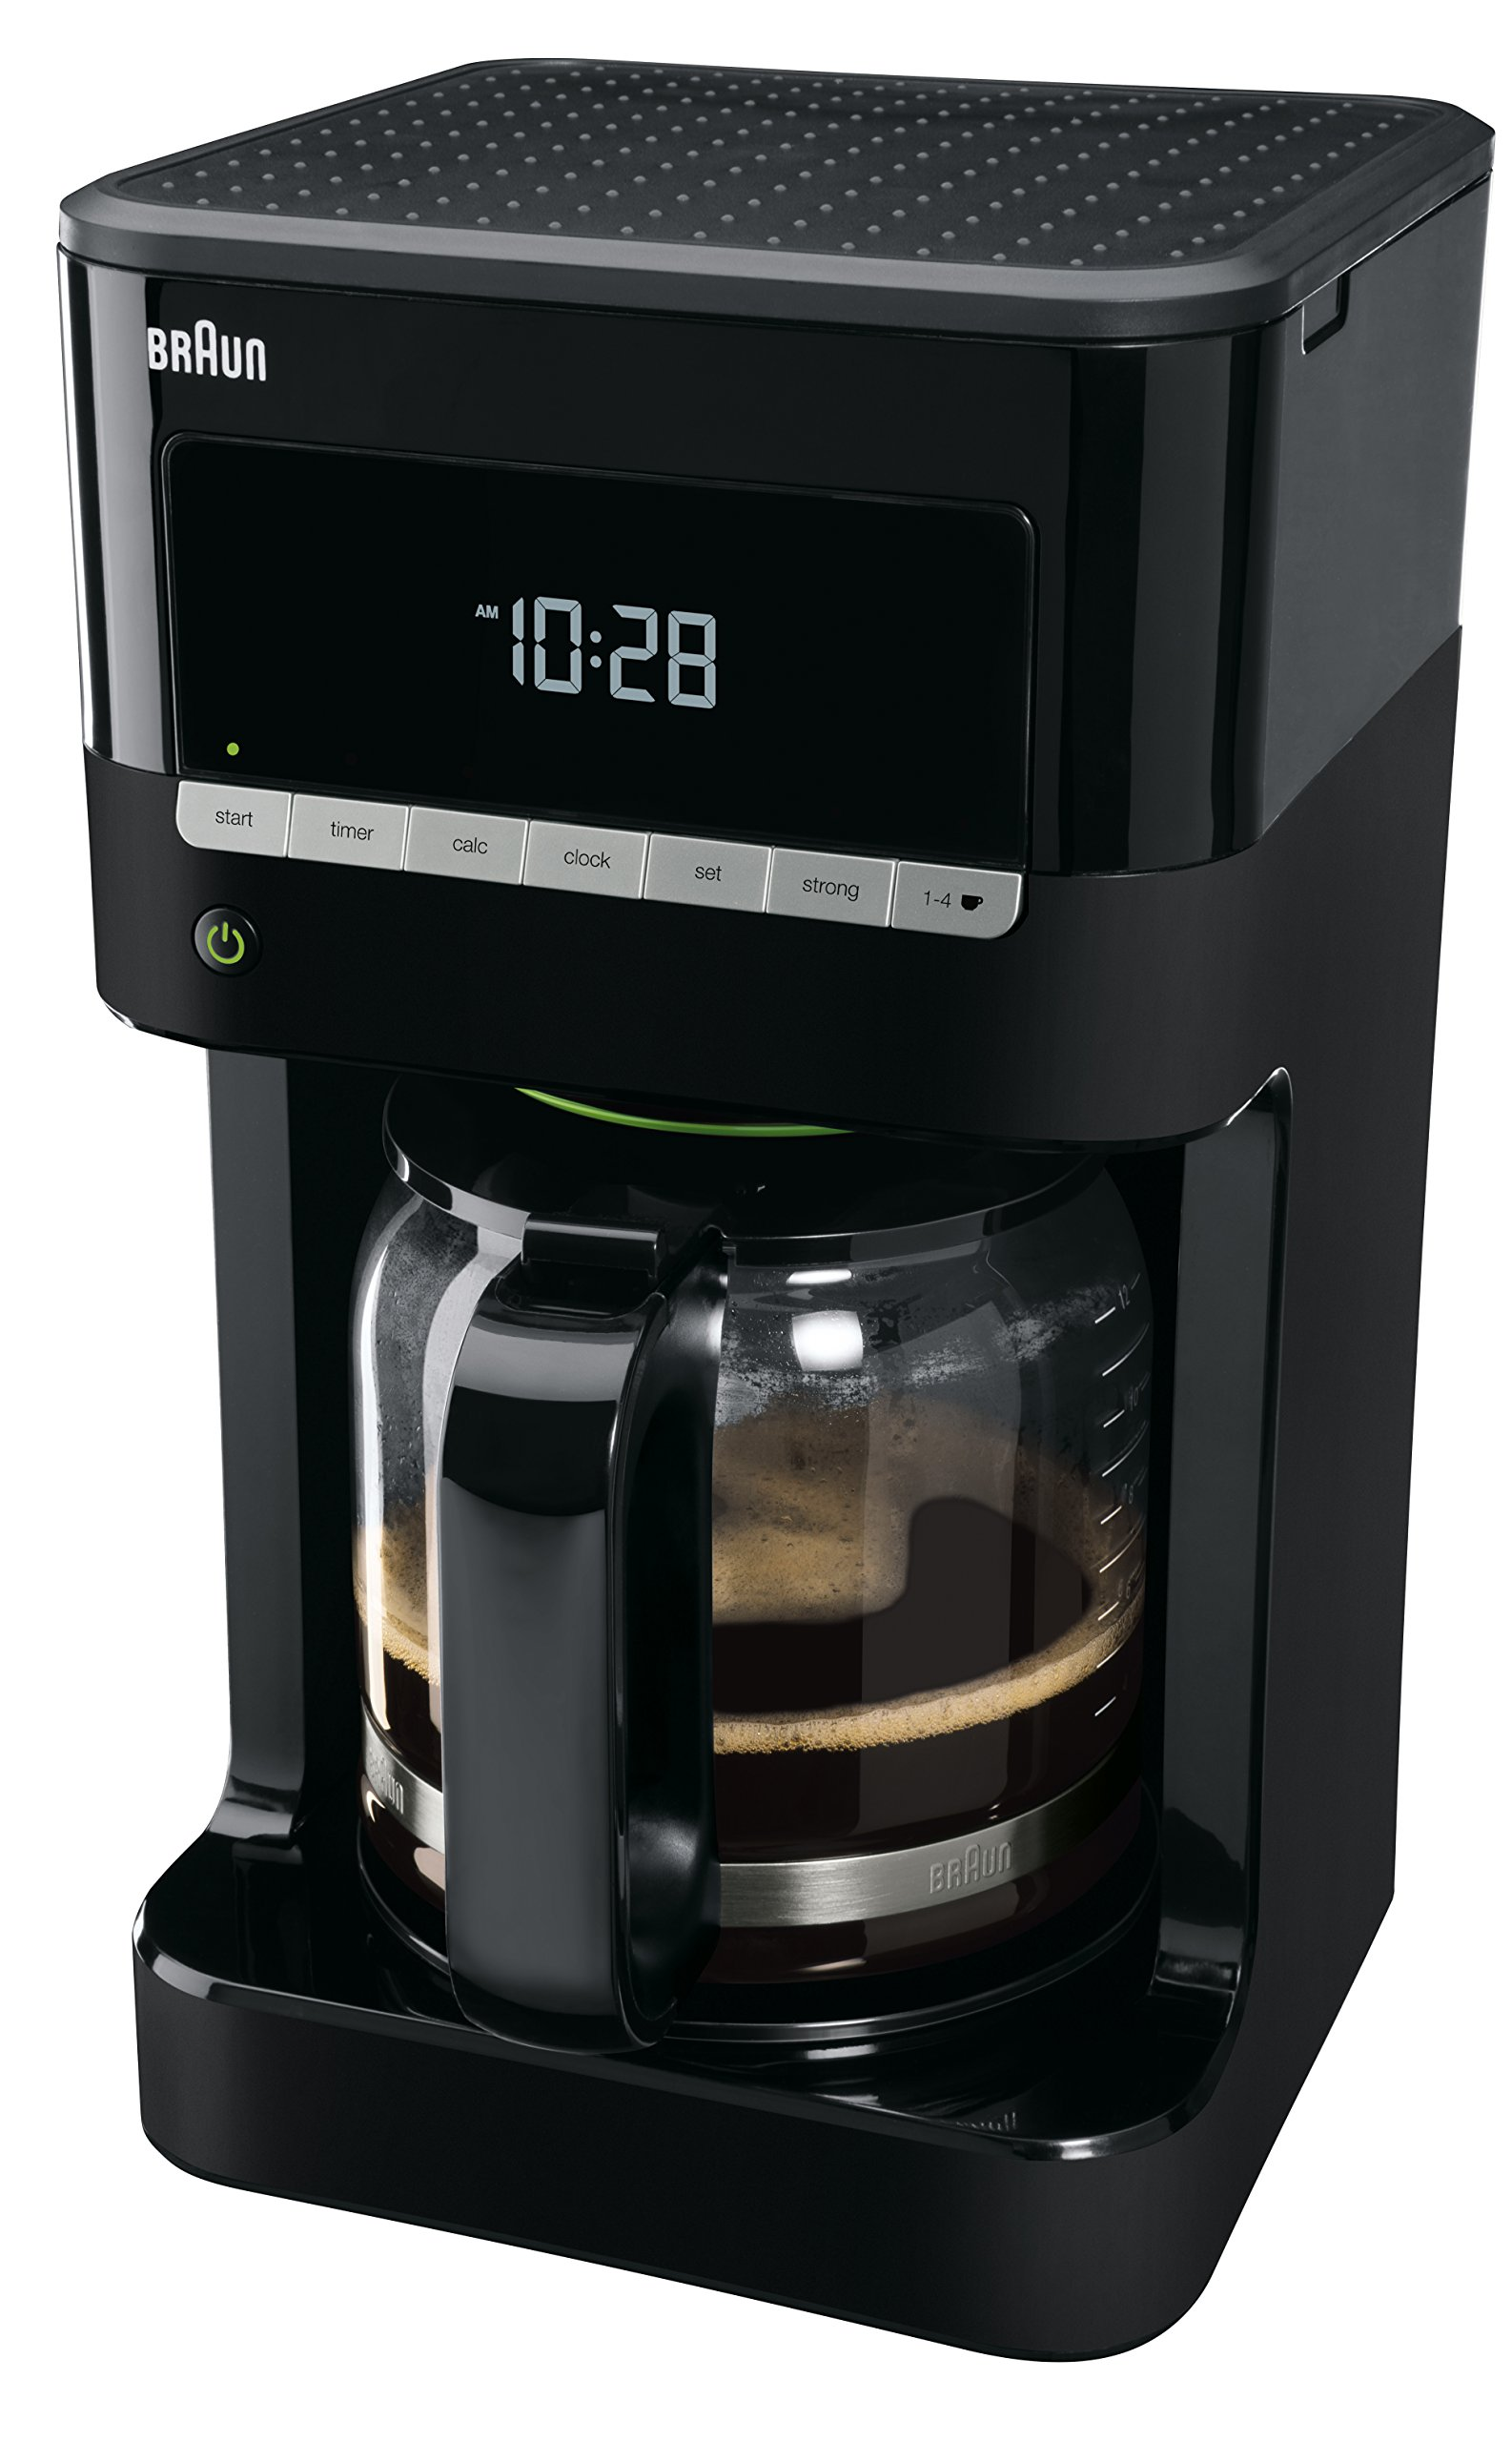 Braun-Kaffeemaschine-inkl-Glaskanne